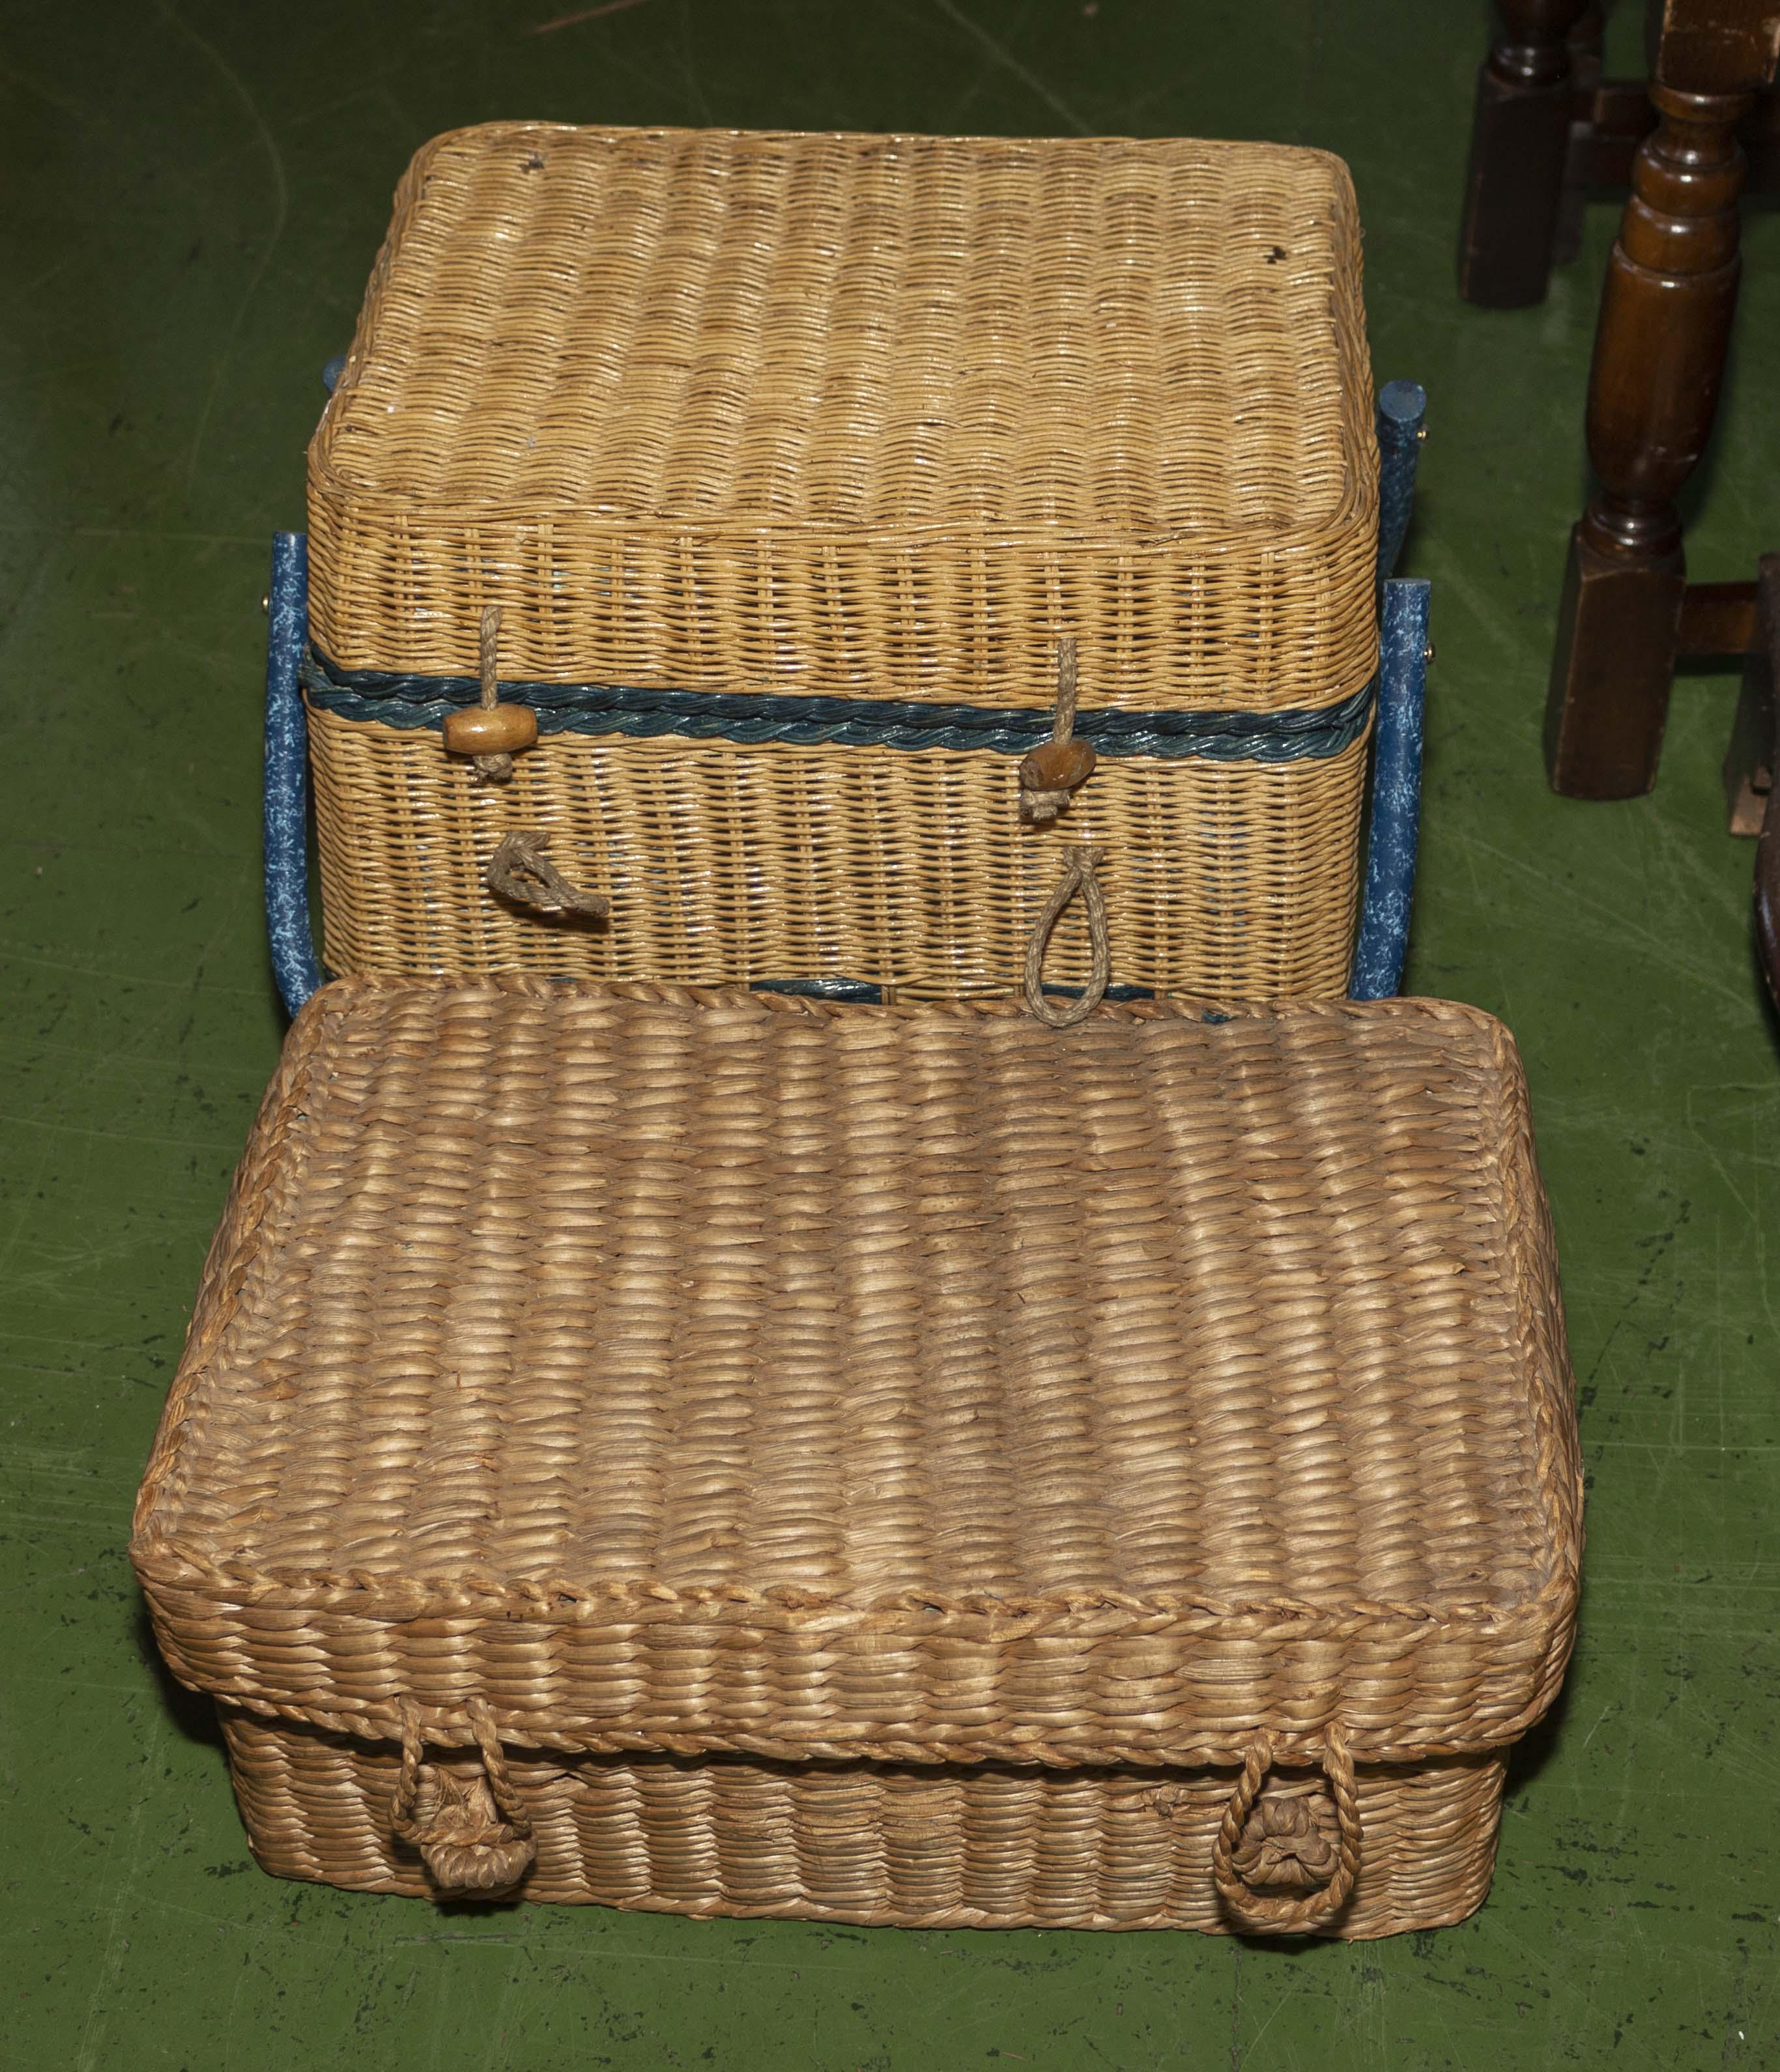 Two wicker picnic baskets